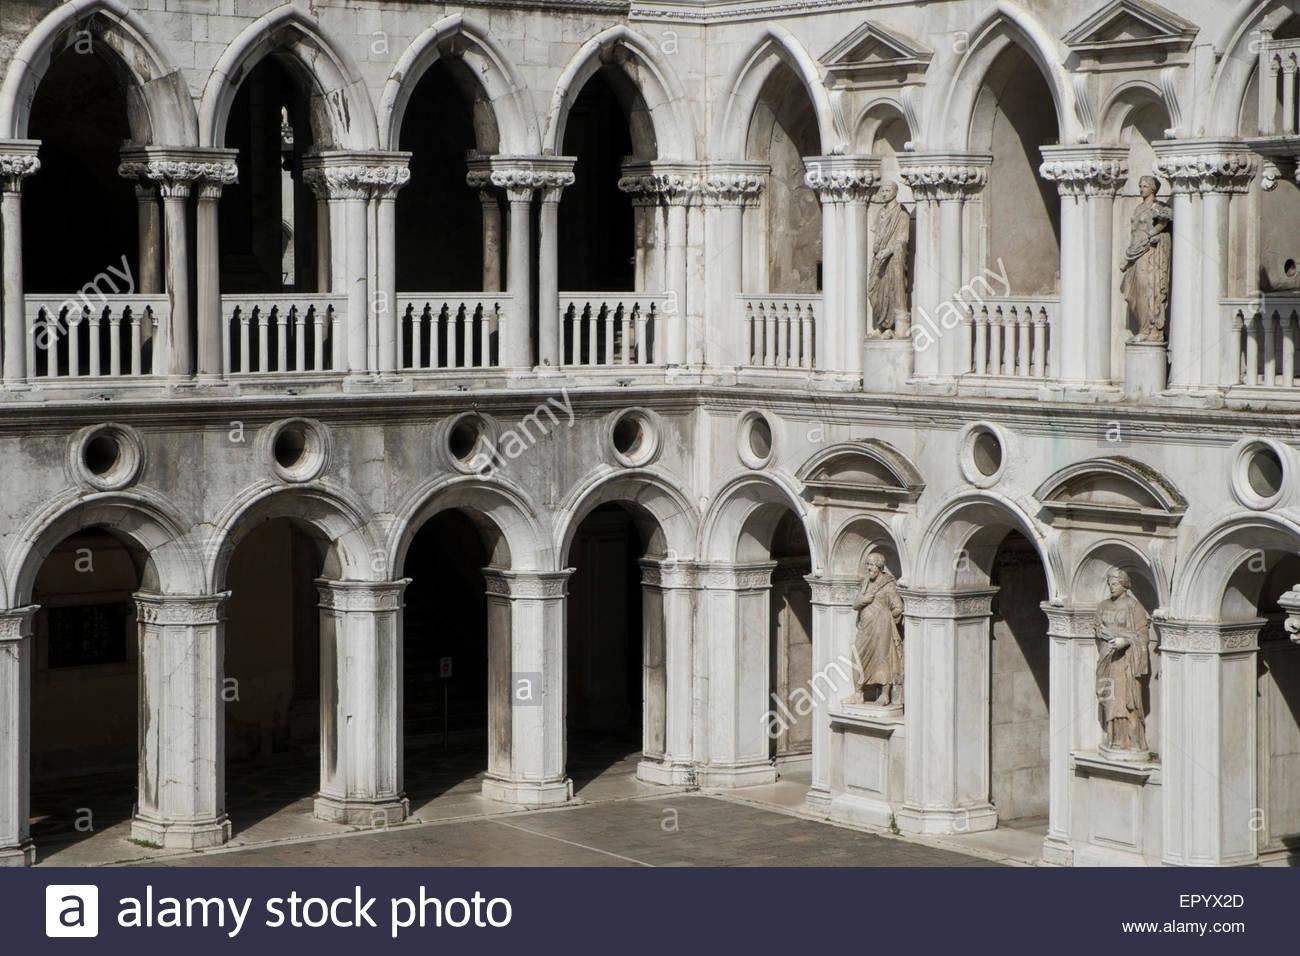 Palazzo Ducale Courtyard Venice Italy Stock Photo 82977061 Alamy